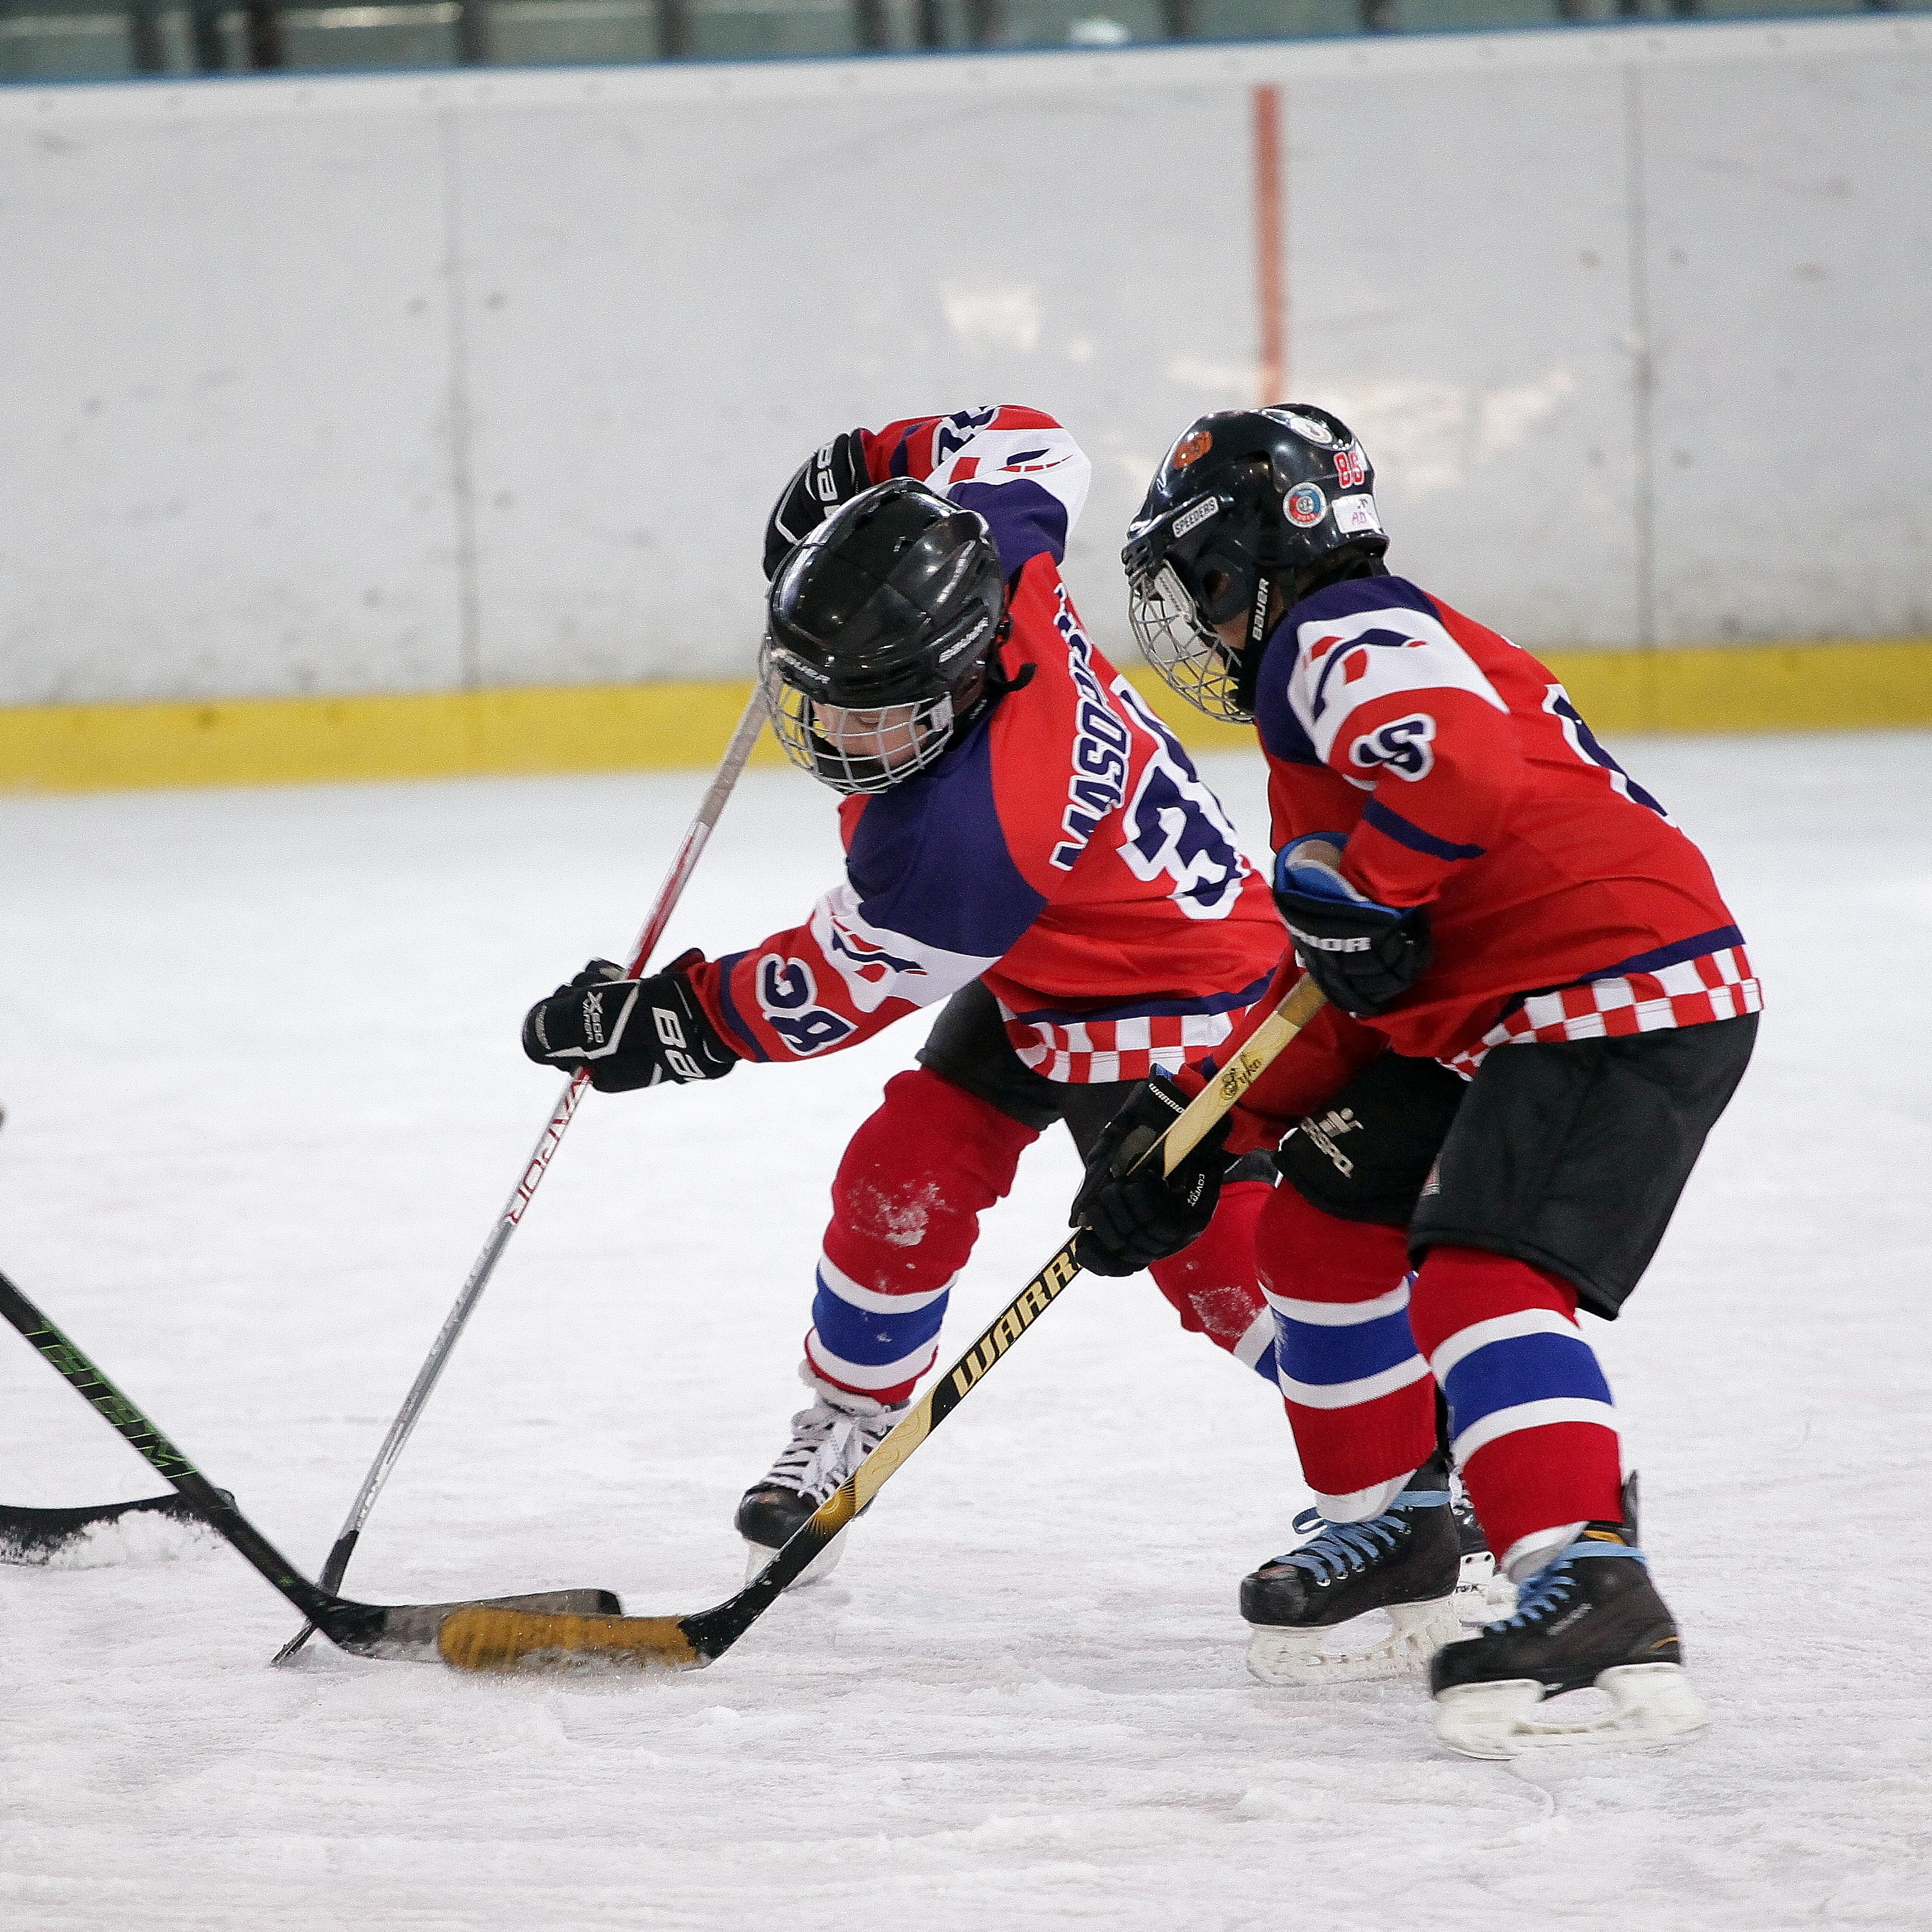 Speeders Hockey Bratislava turnaj karvina_ hokejova akcia